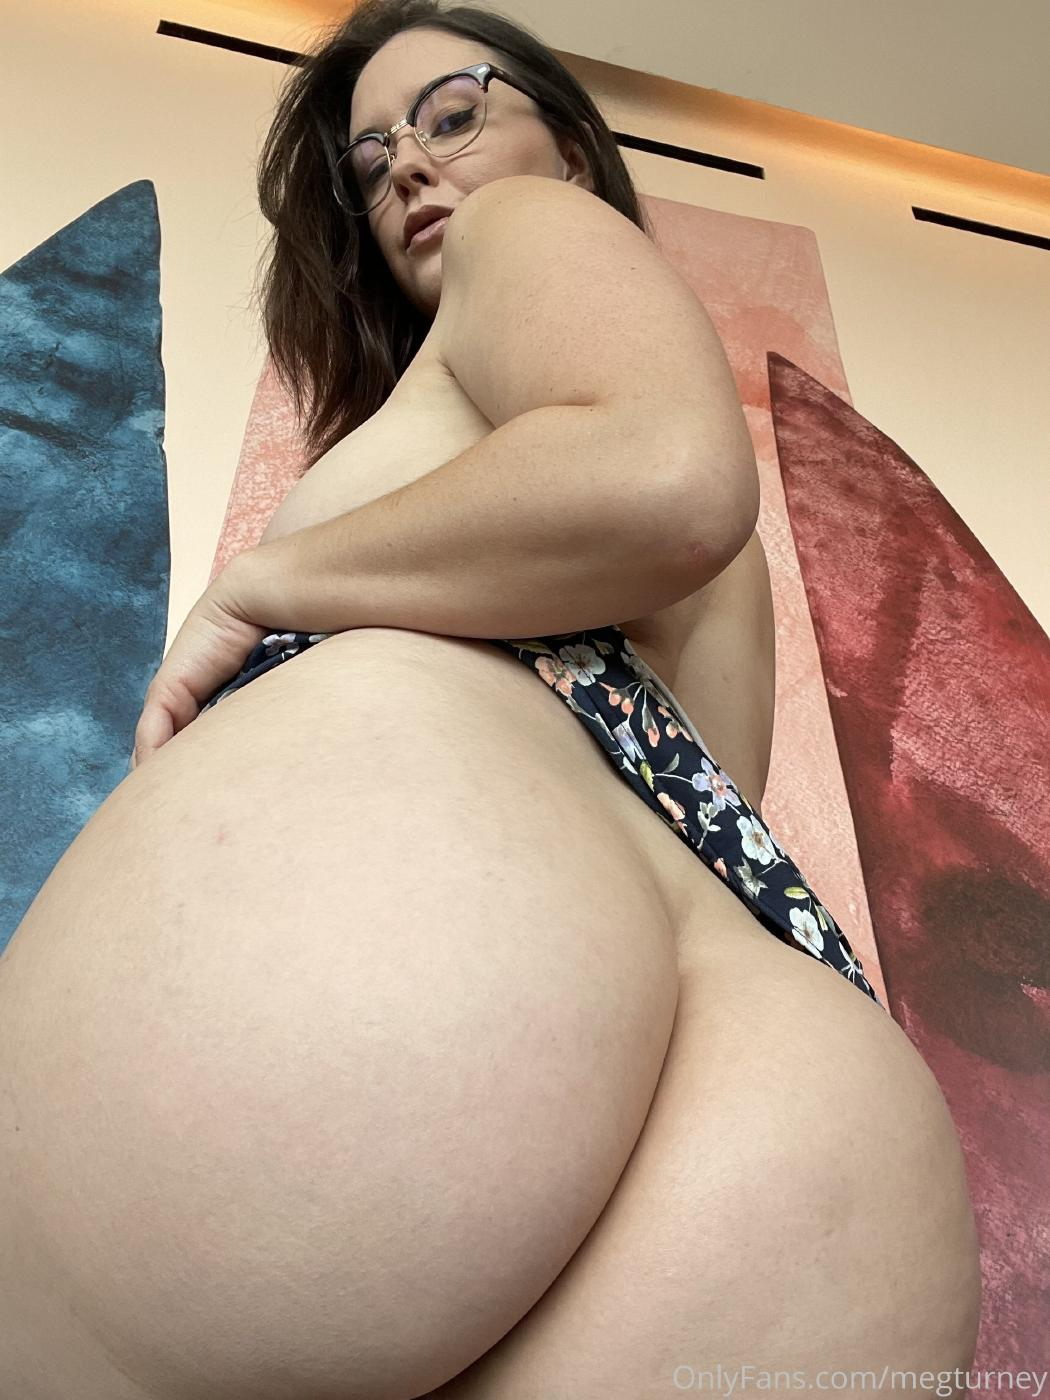 Meg Turney Unshaven Pussy Candids Onlyfans Set Leaked Mydkux